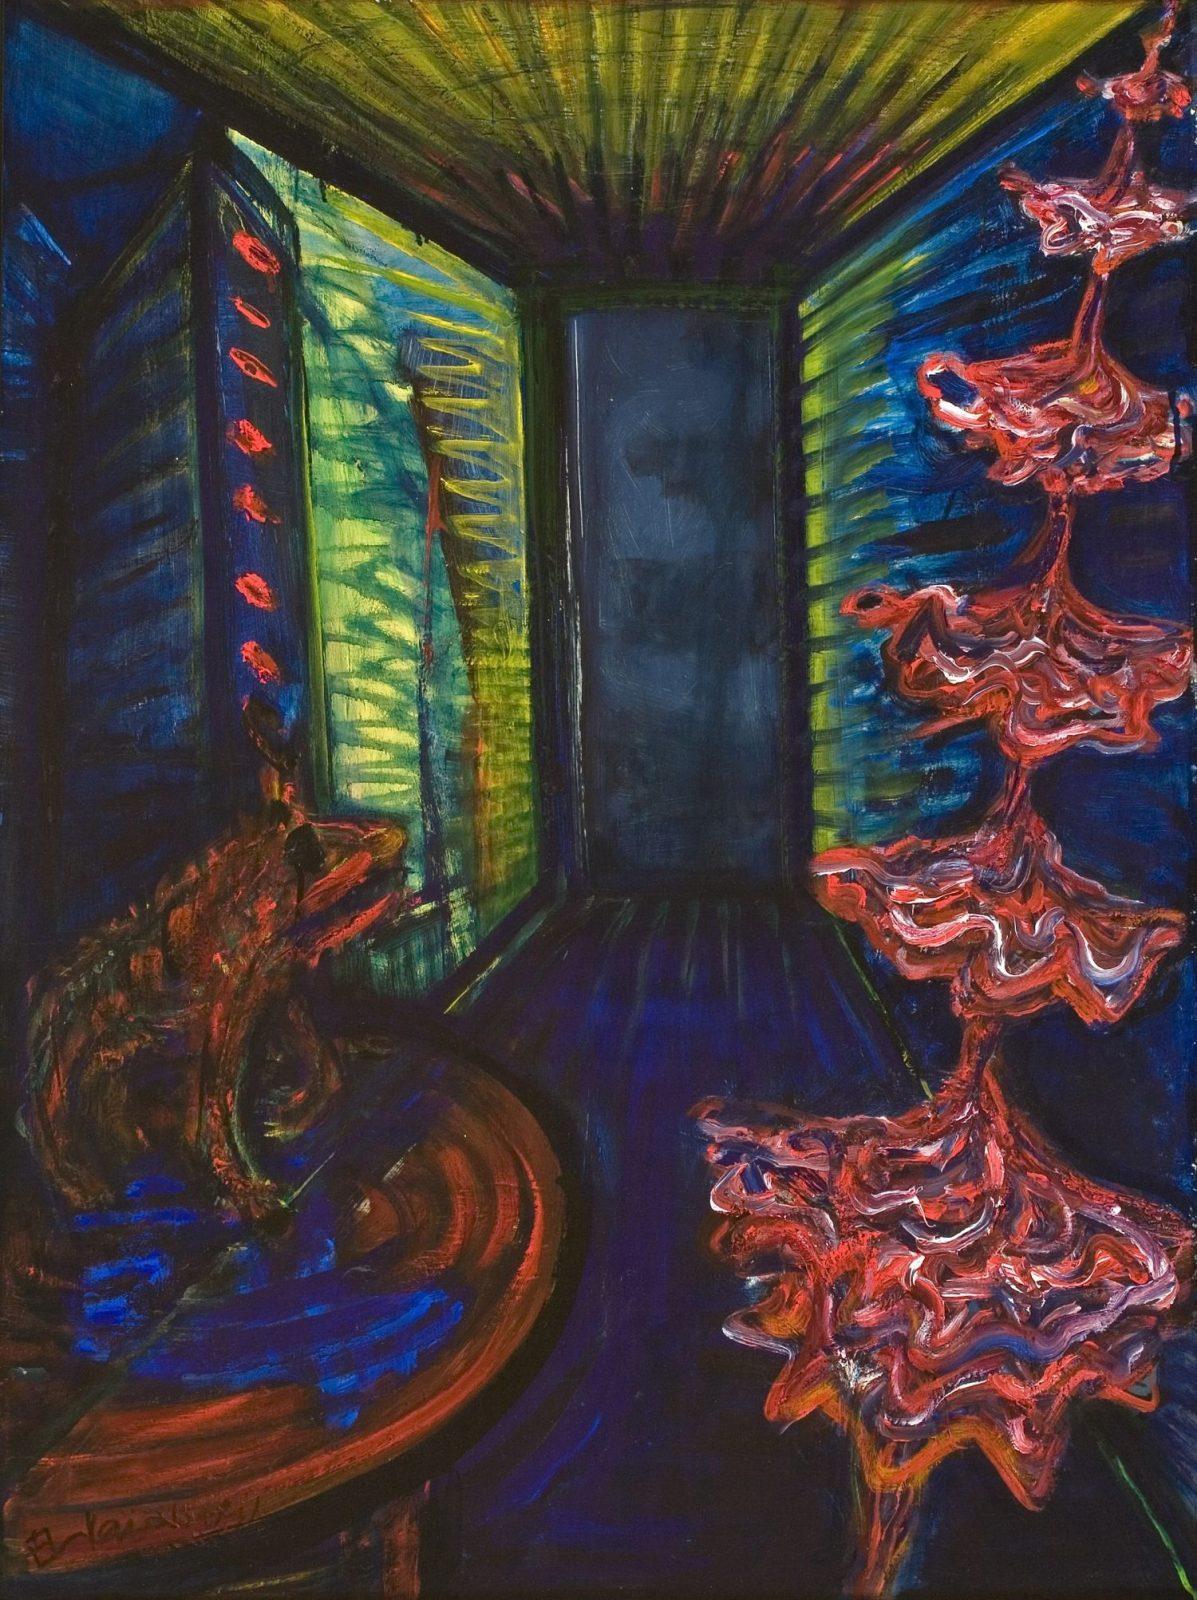 El Kazovszkij: Double Storey Dancer 2. / Double Storey Coppelia